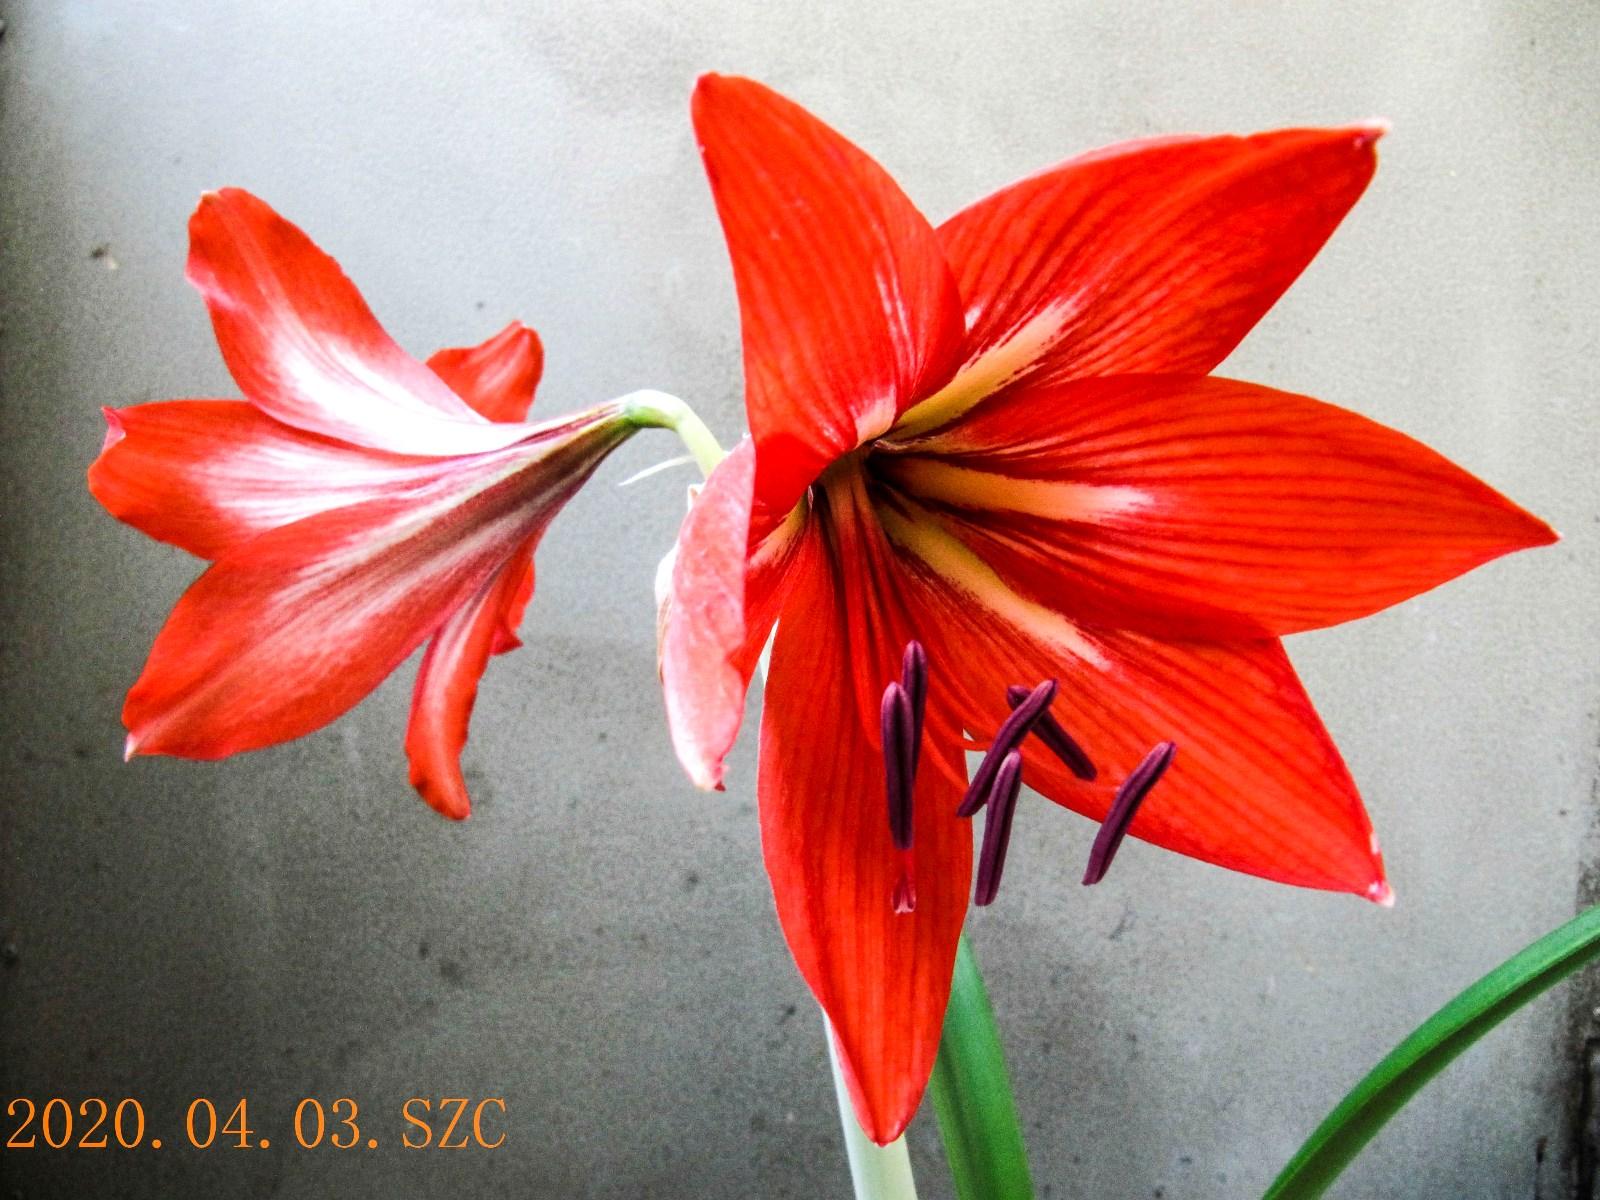 5IMG_3835(2020)_1-1_1.jpg